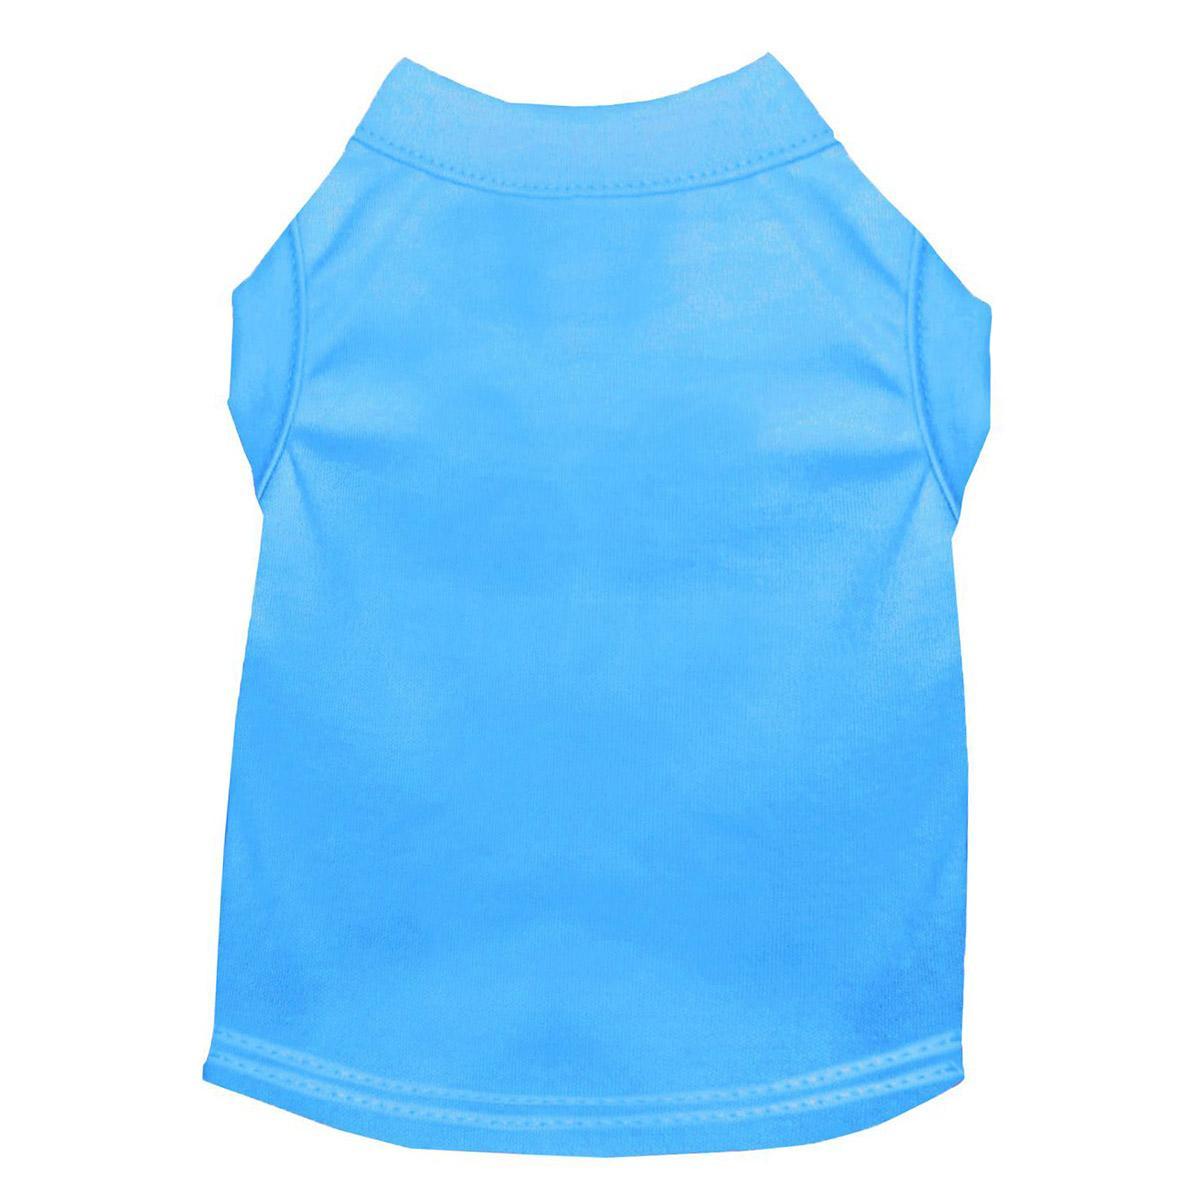 Plain Dog and Cat Shirt - Bermuda Blue